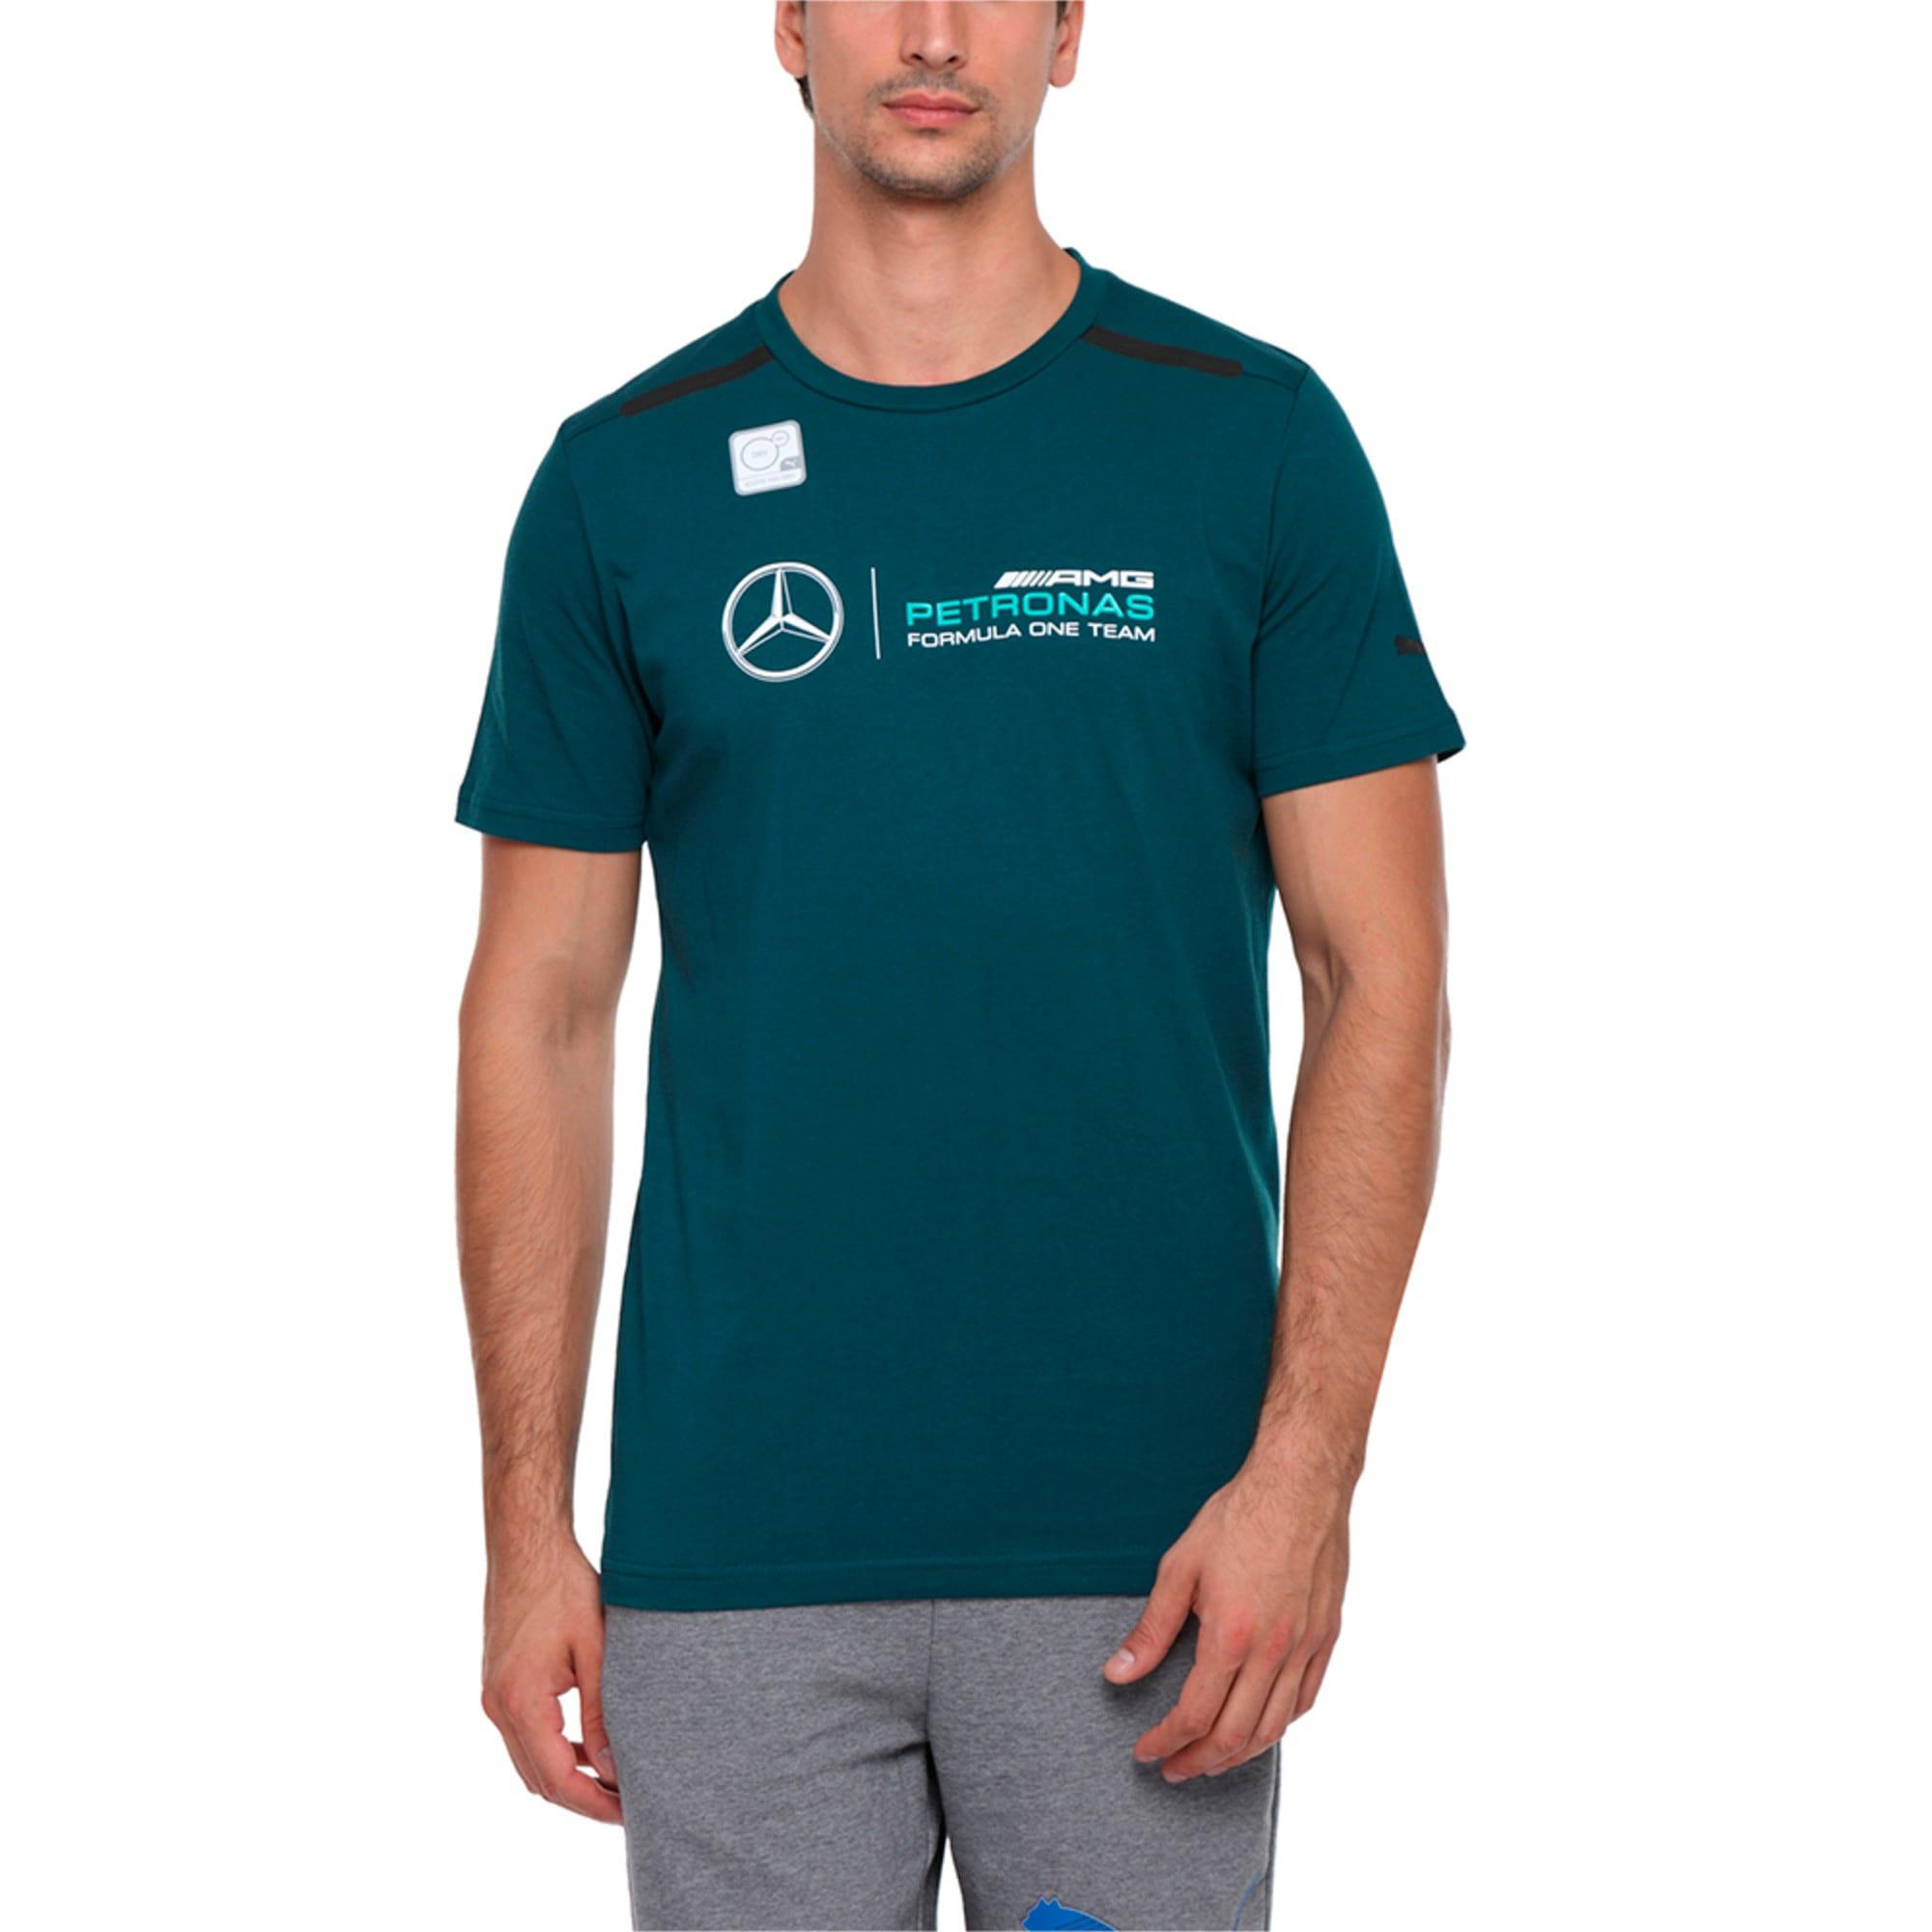 Thumbnail 2 of MERCEDES AMG PETRONAS Men's Logo T-Shirt, Deep Teal, medium-IND